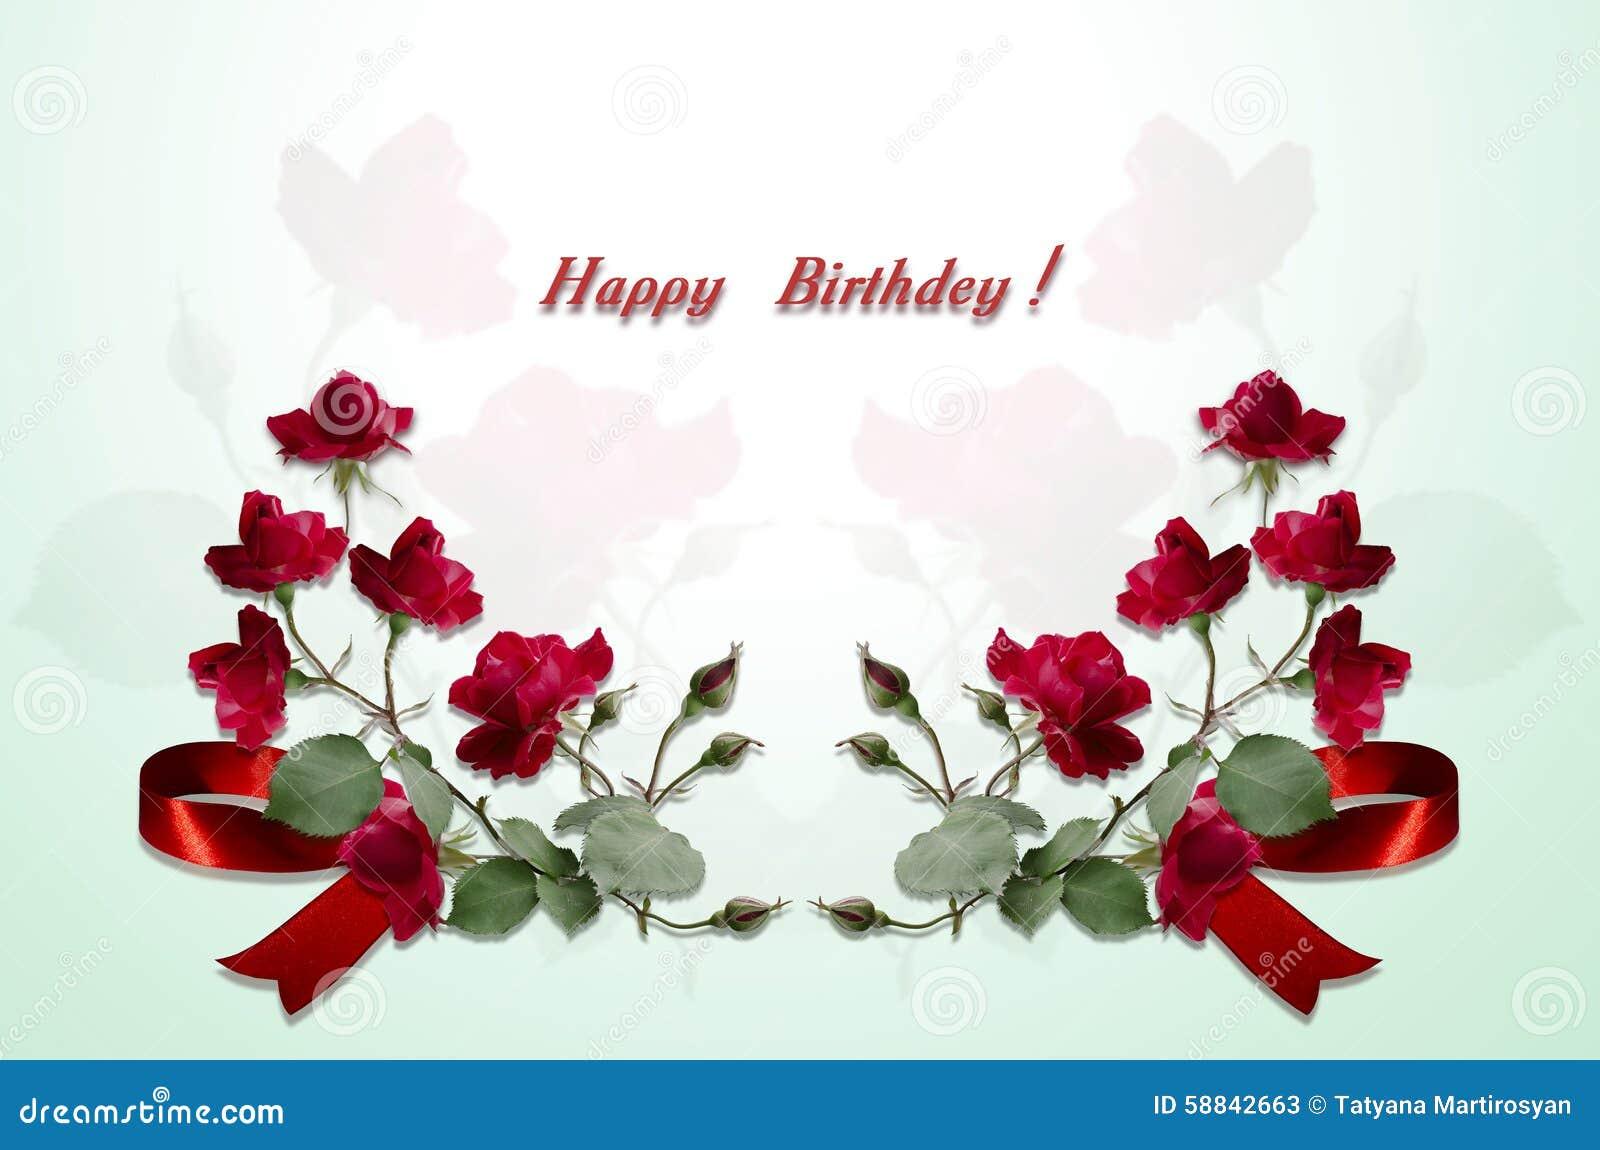 happy birthday bouquet wallpaper - photo #17